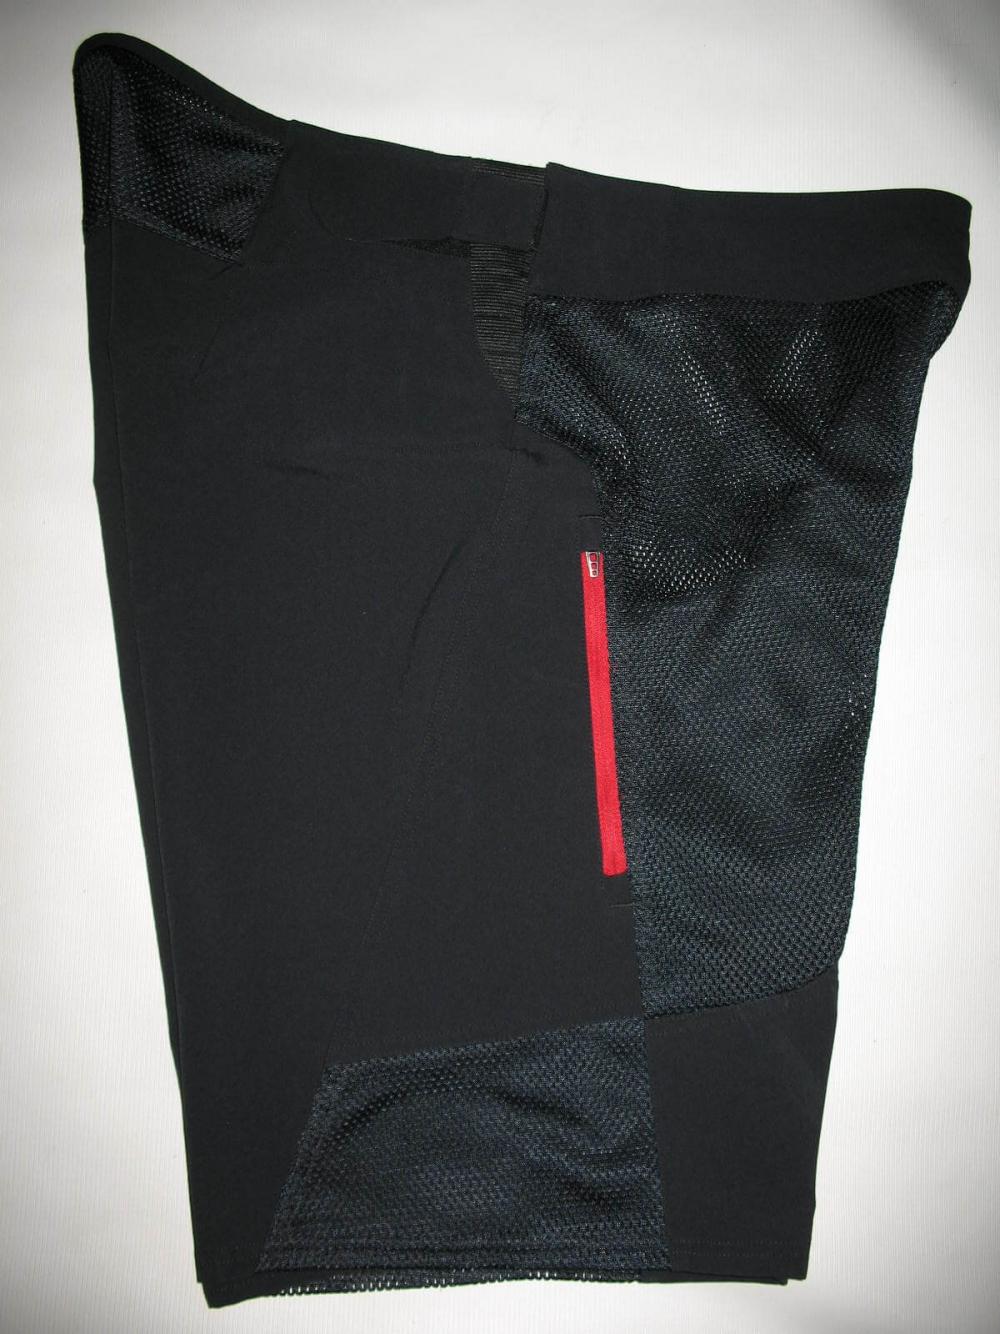 Велошорты PEARL IZUMI veer bike shorts (размер  M) - 5